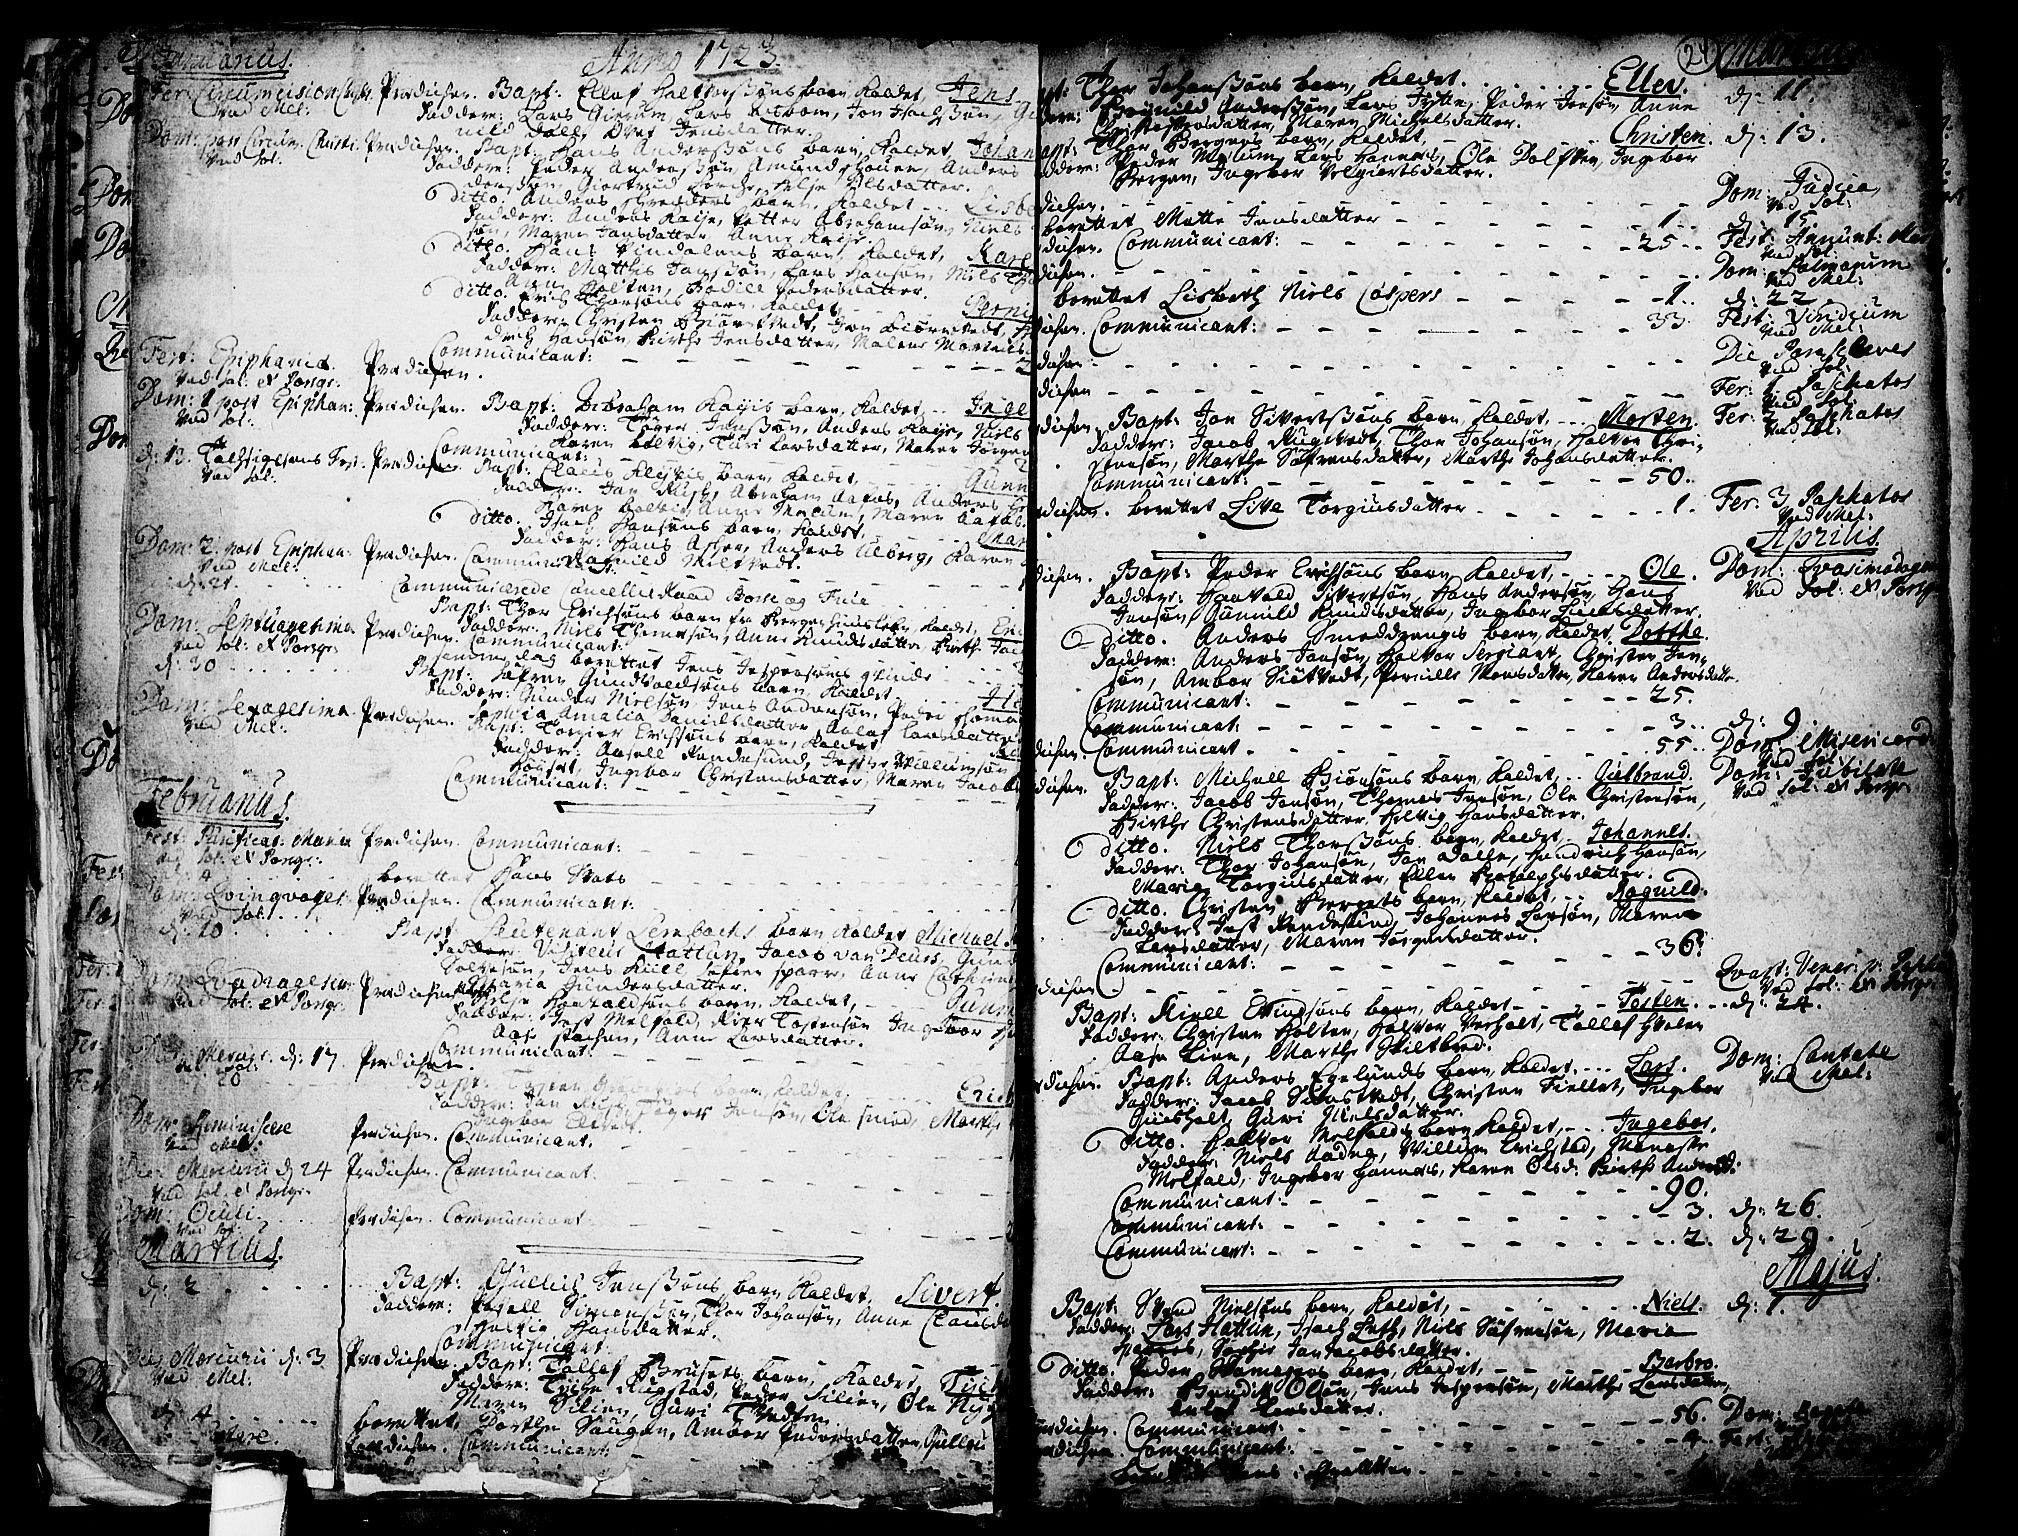 SAKO, Solum kirkebøker, F/Fa/L0002: Ministerialbok nr. I 2, 1713-1761, s. 24